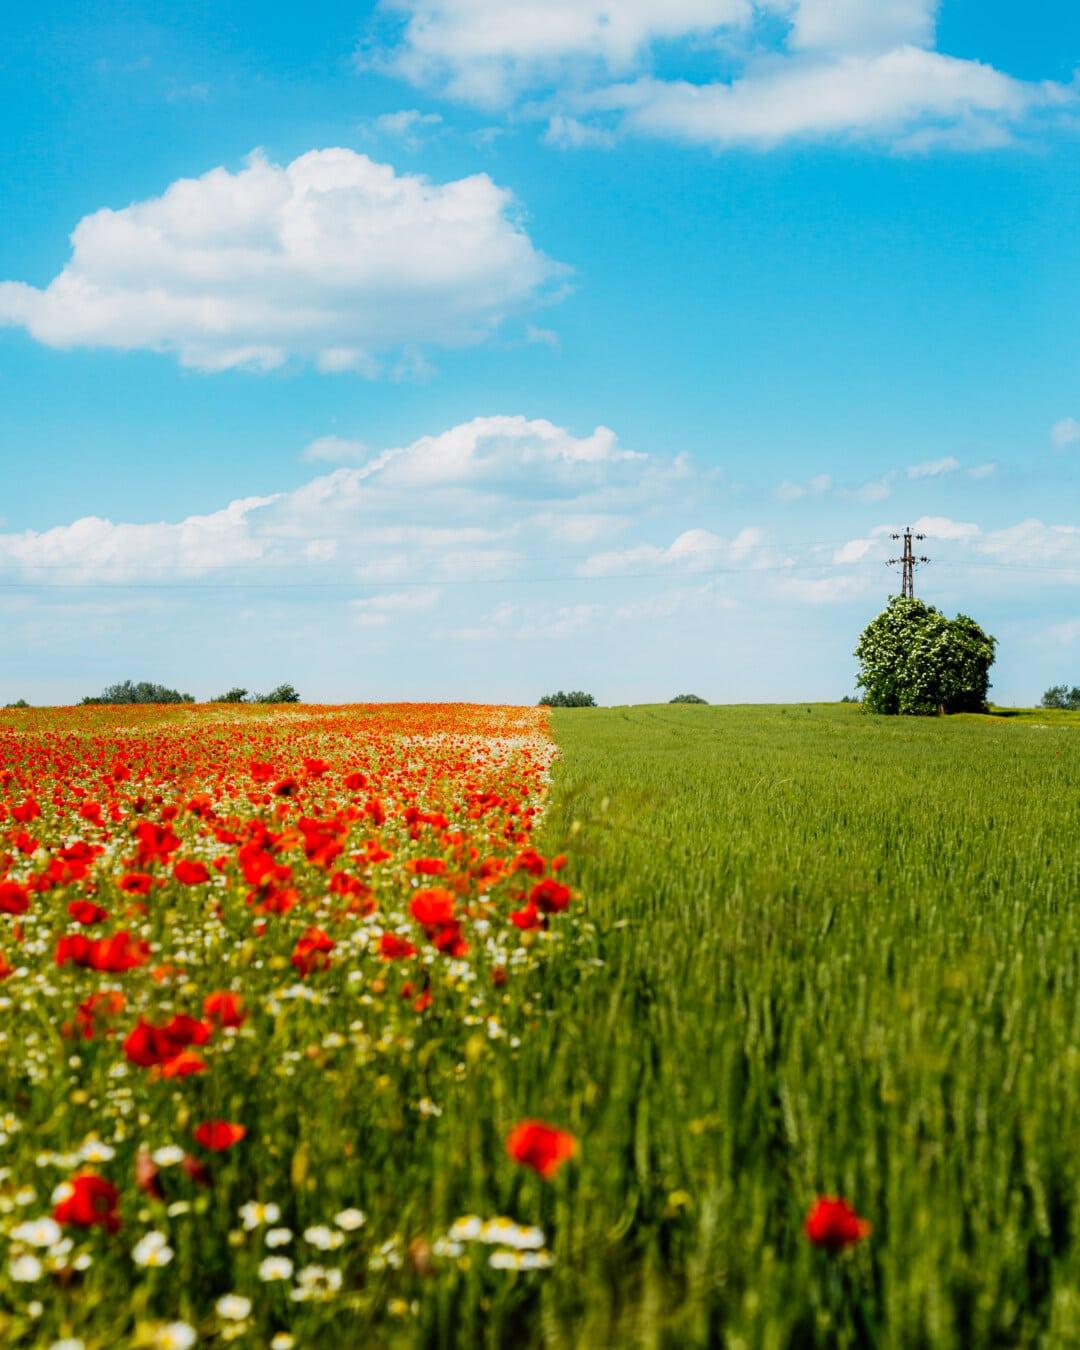 agricultural, wheatfield, field, opium poppy, poppy, flowers, chamomile, grass, meadow, landscape